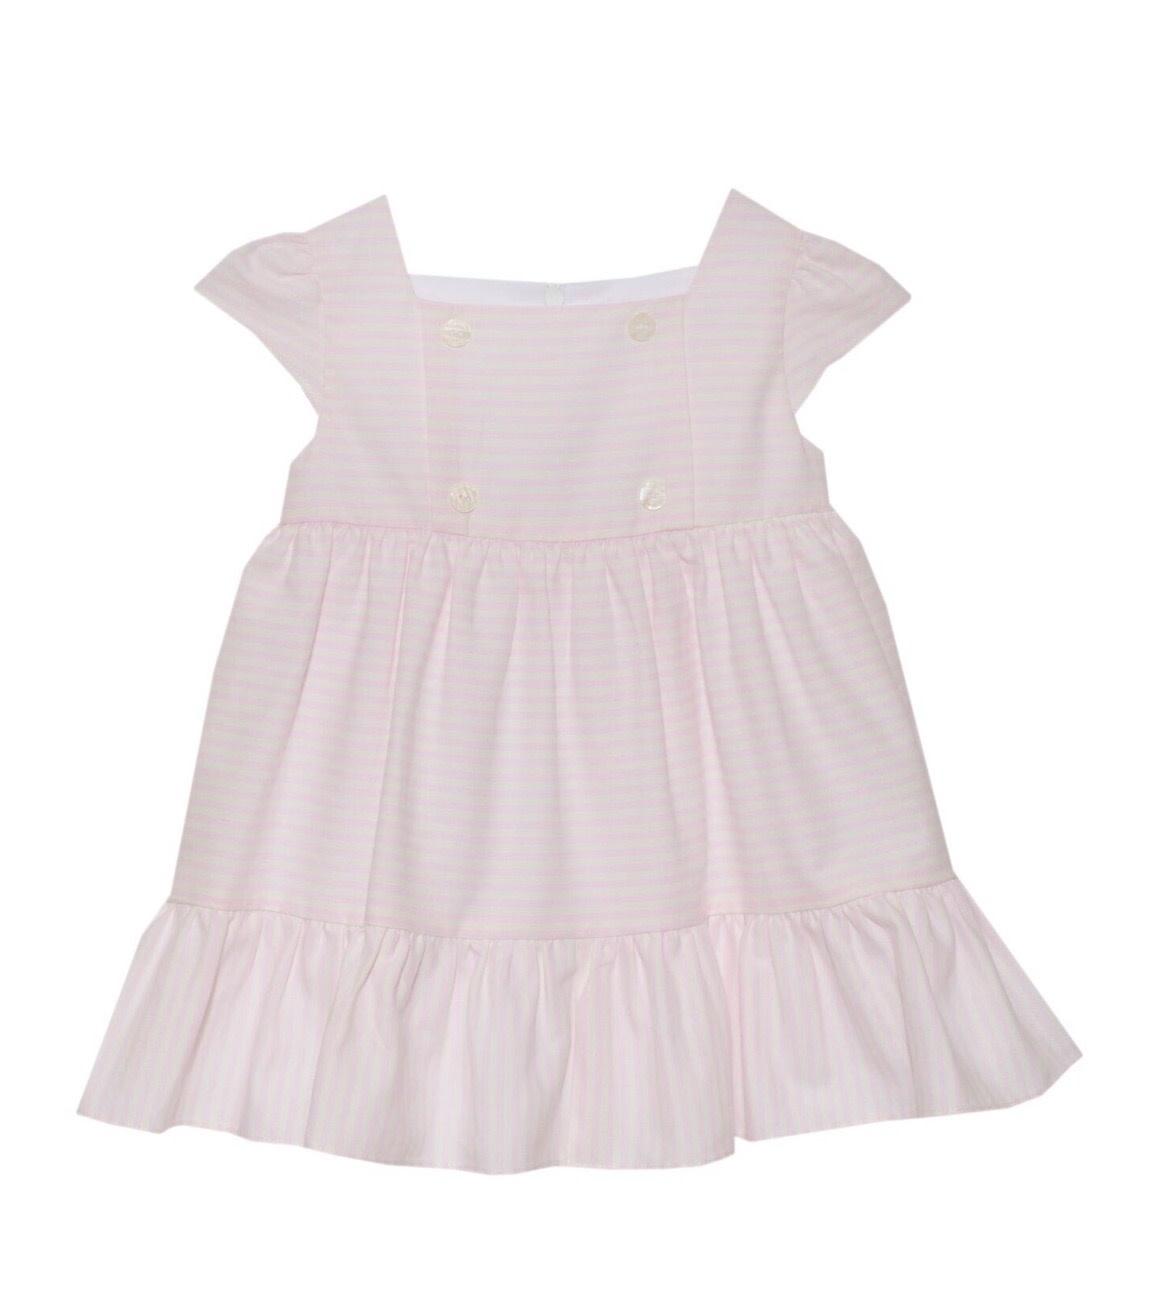 Patachou Patachou Baby 211 Pink & White Stripe Dress